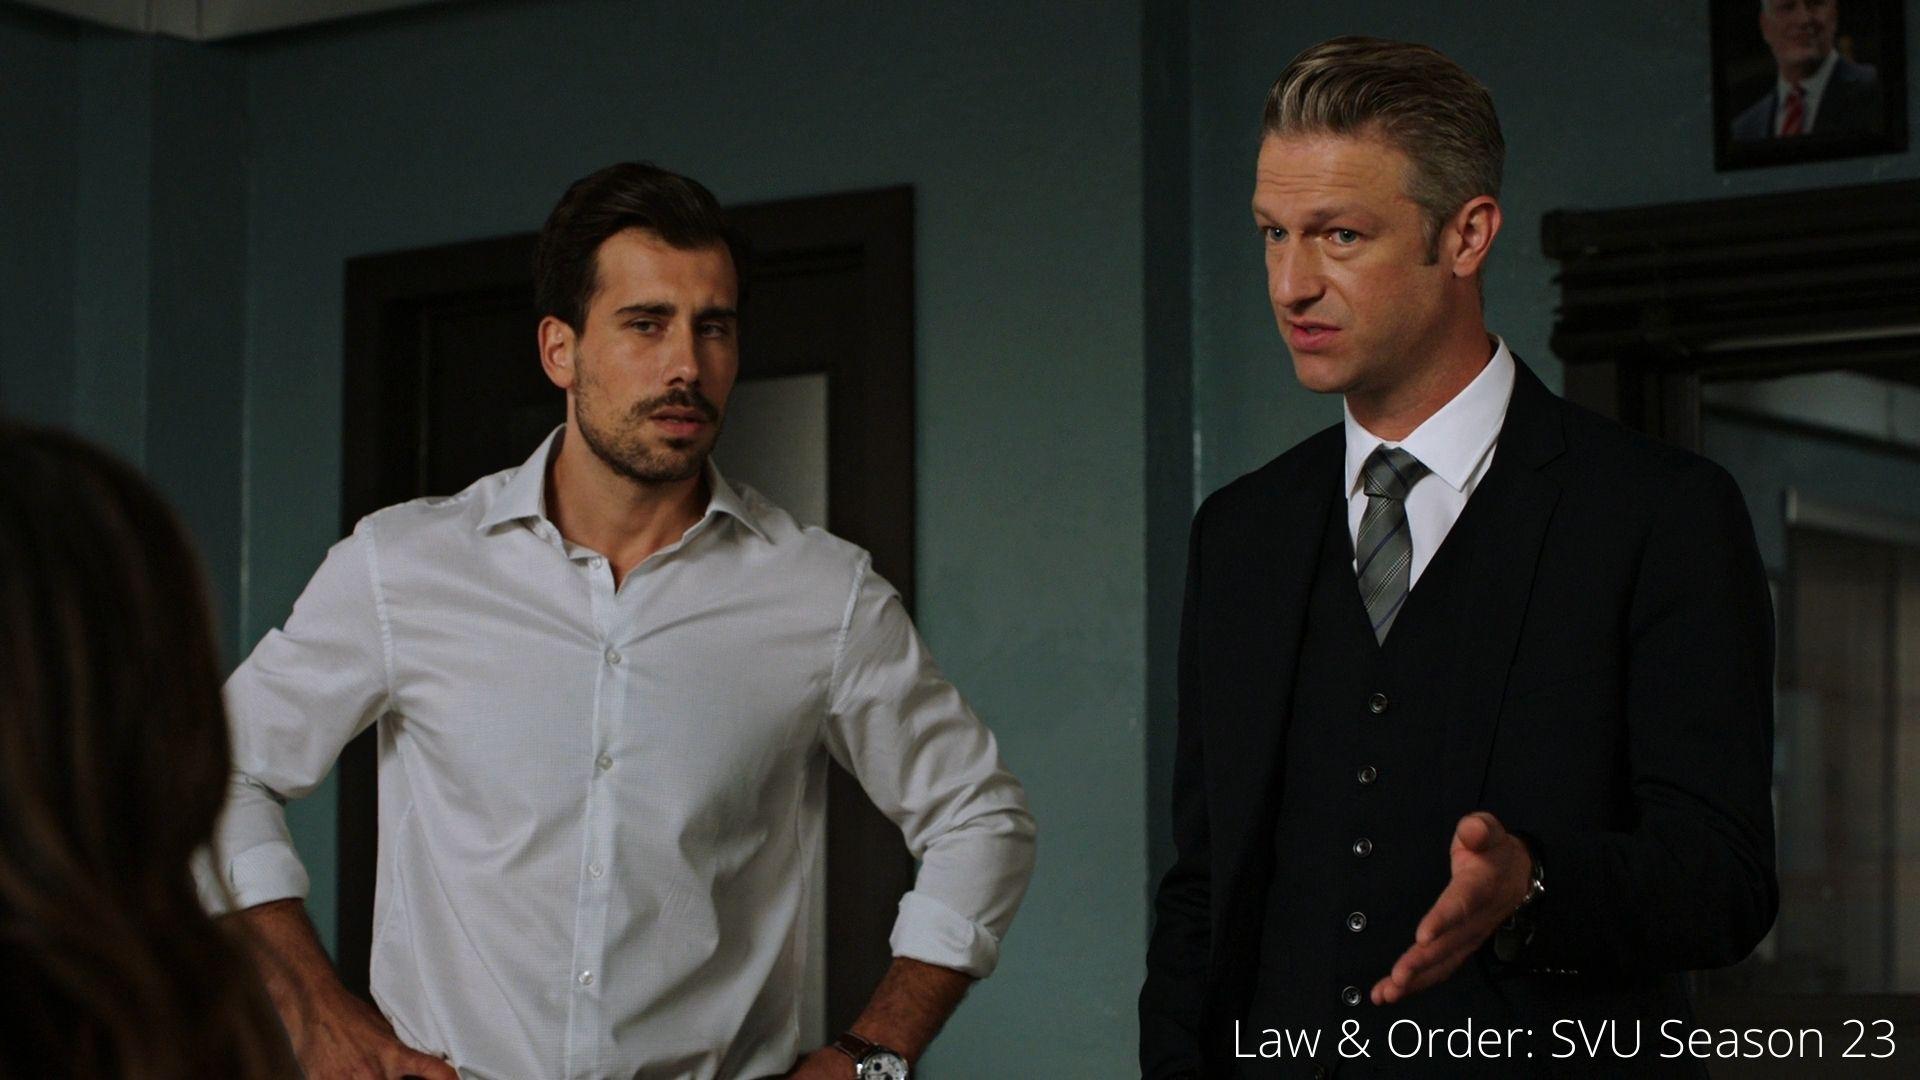 Law & Order: Special Victims Unit Season 23 Episode 5